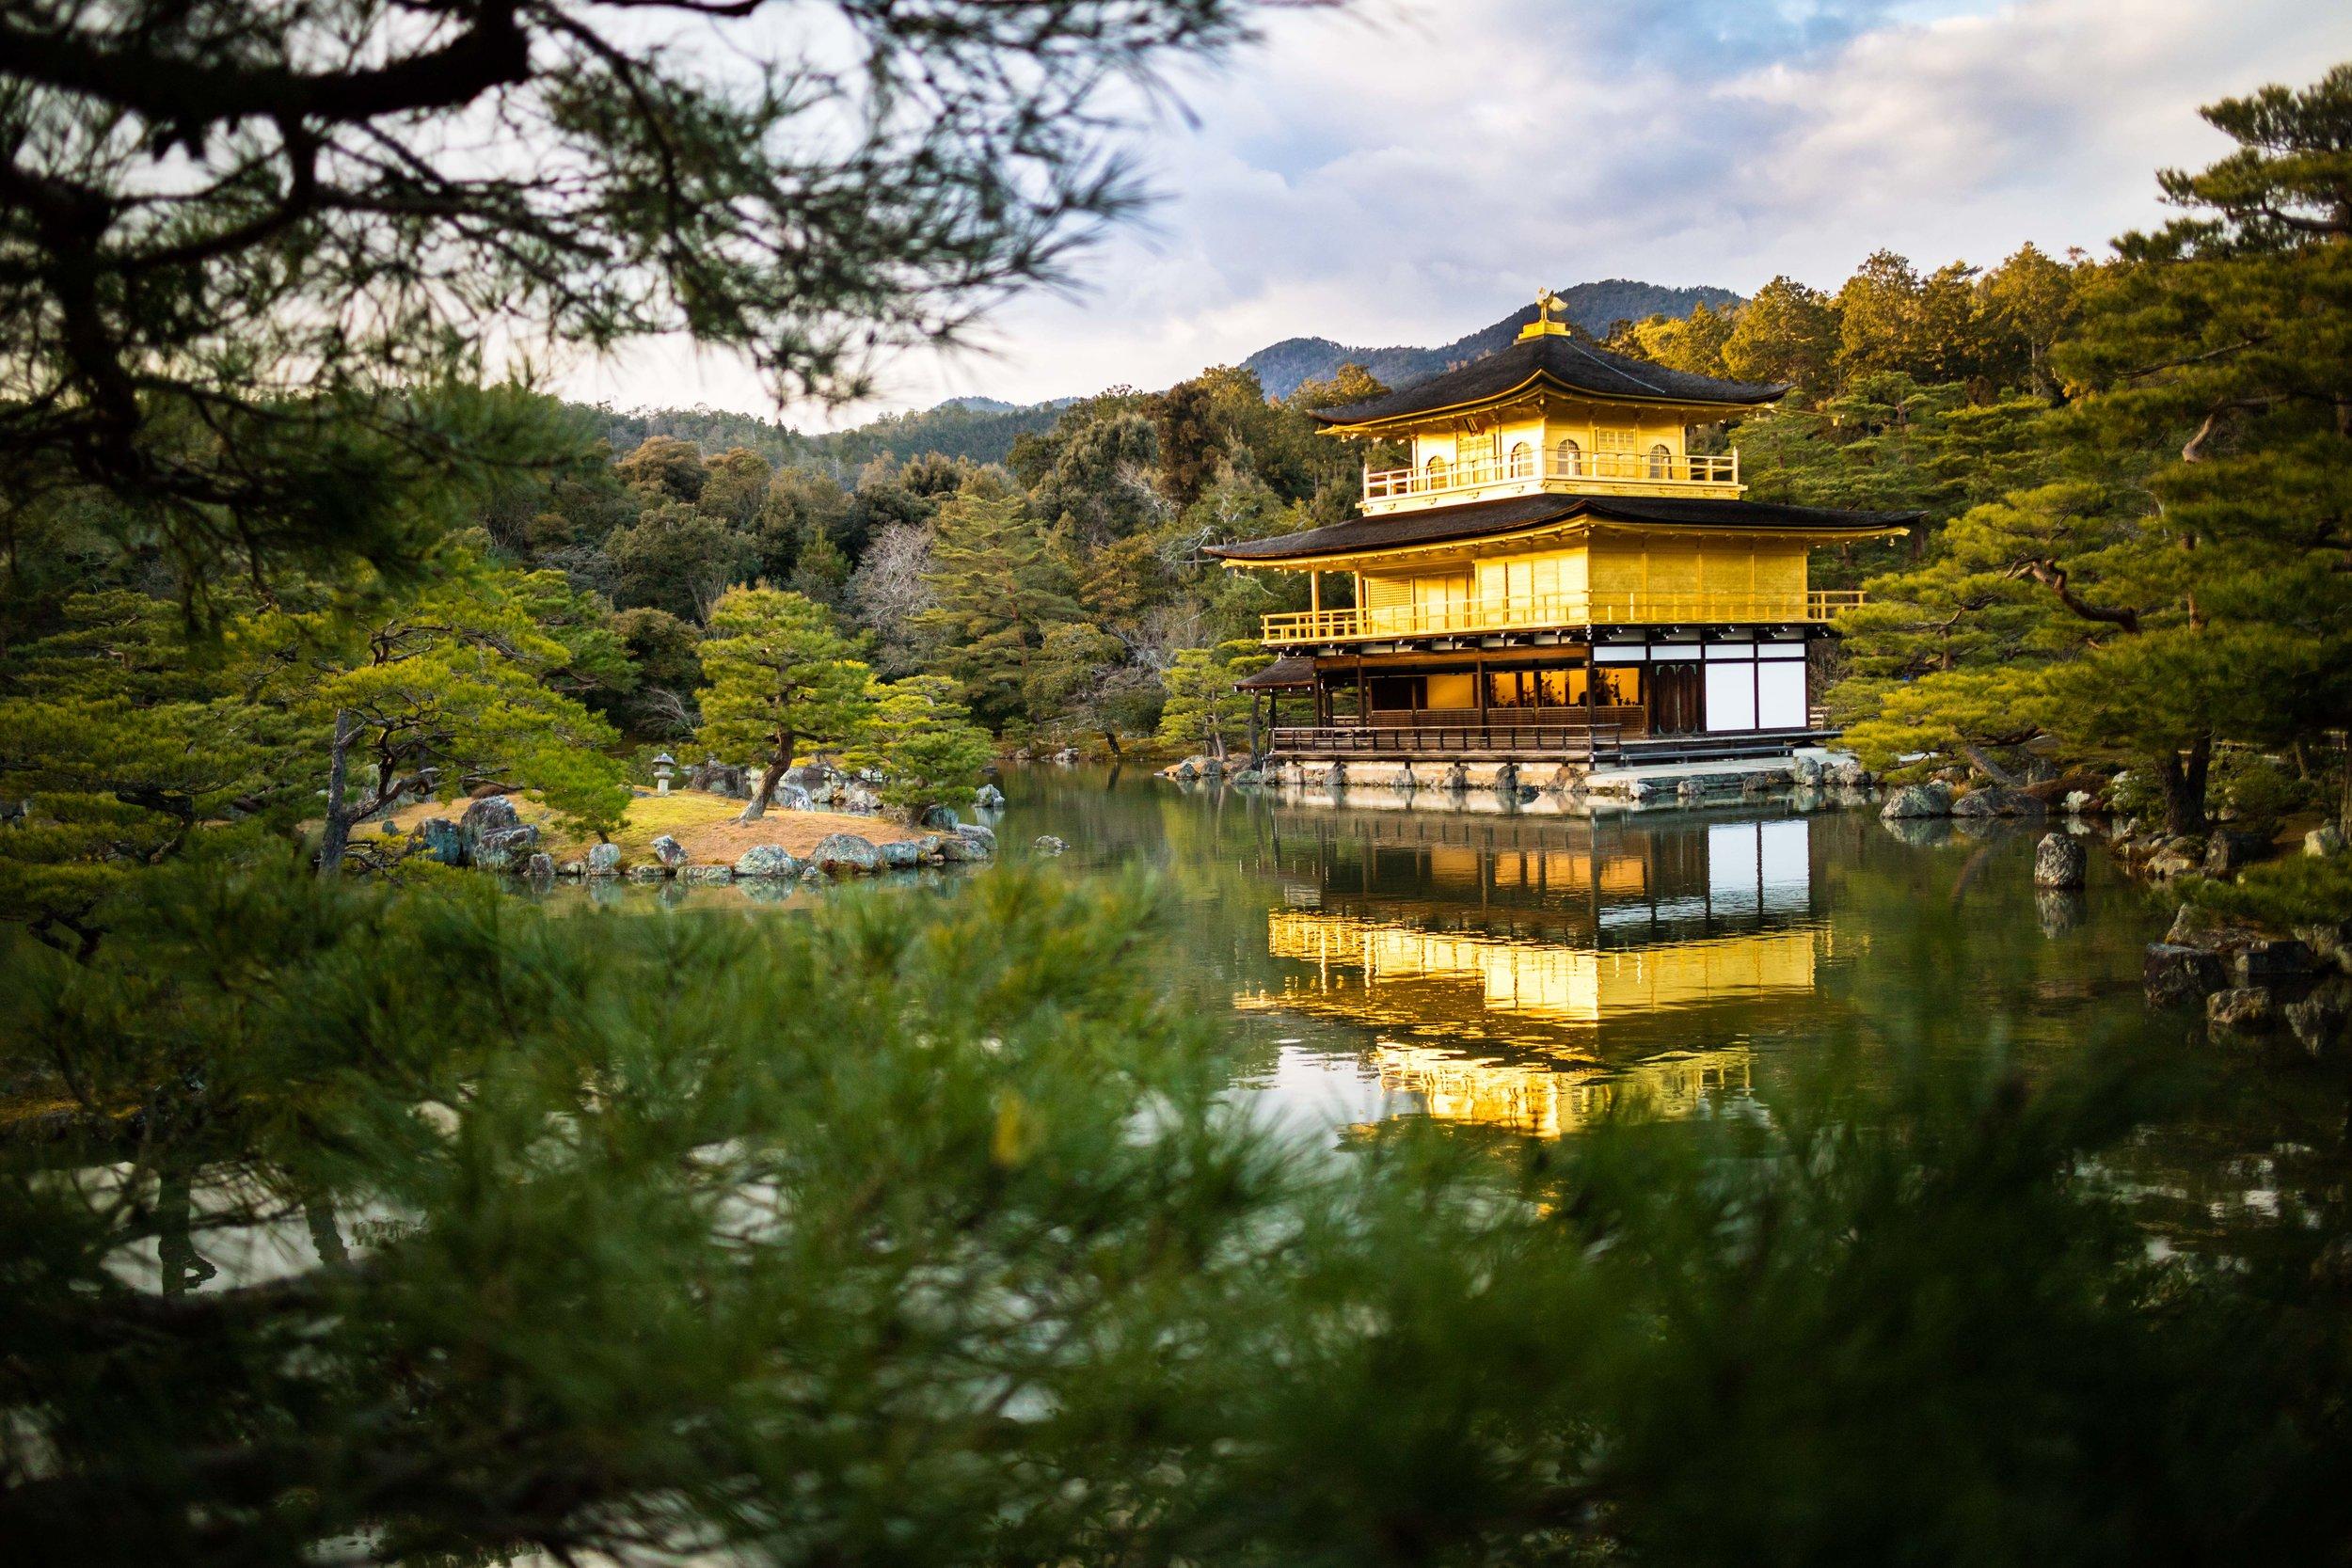 Kinkaku-ji, the Golden Pavillon, Kyoto.